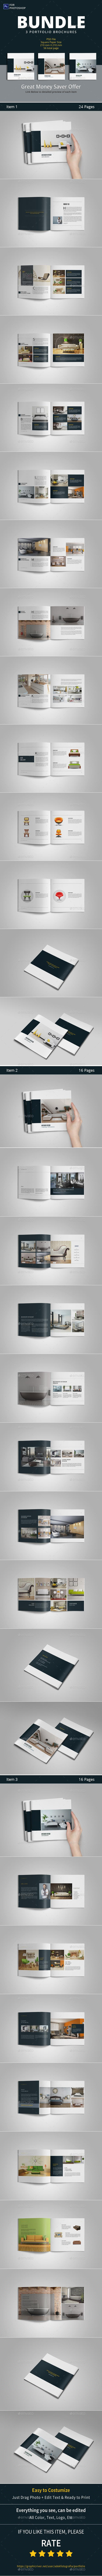 Portfolio Brochure BUNDLE - Portfolio Brochures